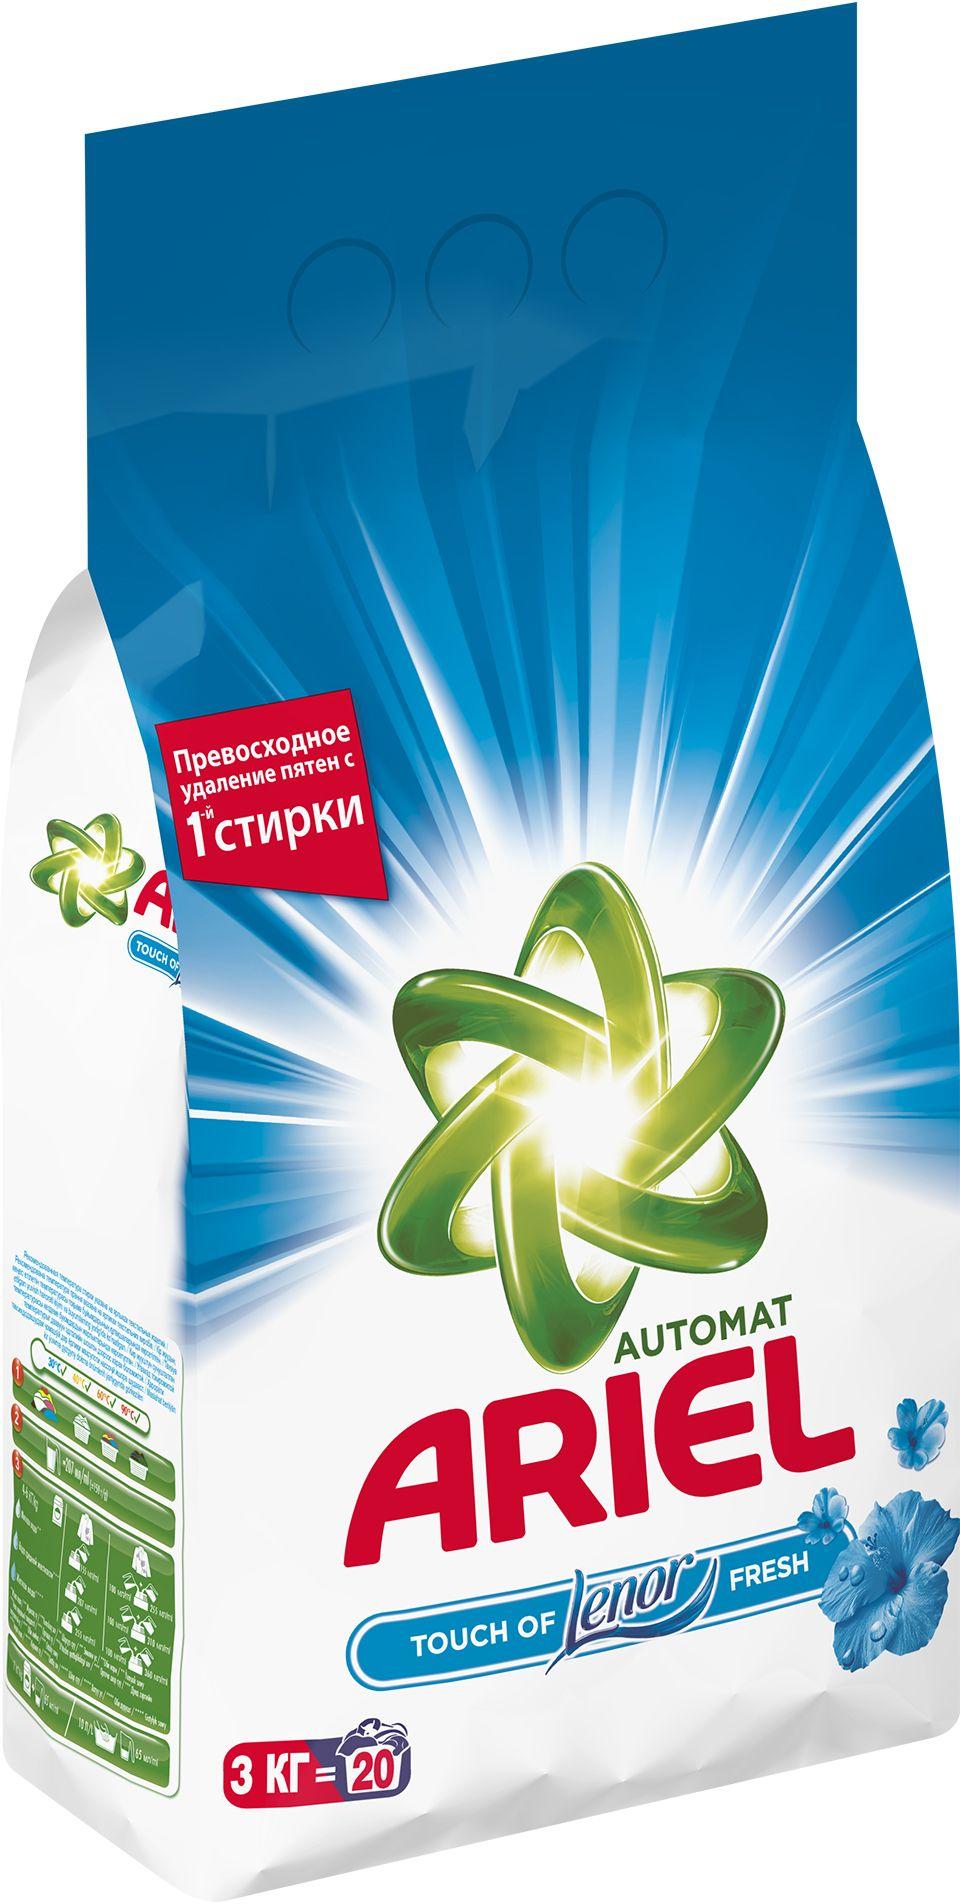 ariel ARIEL 2в1 Lenor Effect 3 кг Автомат (5413149601413)